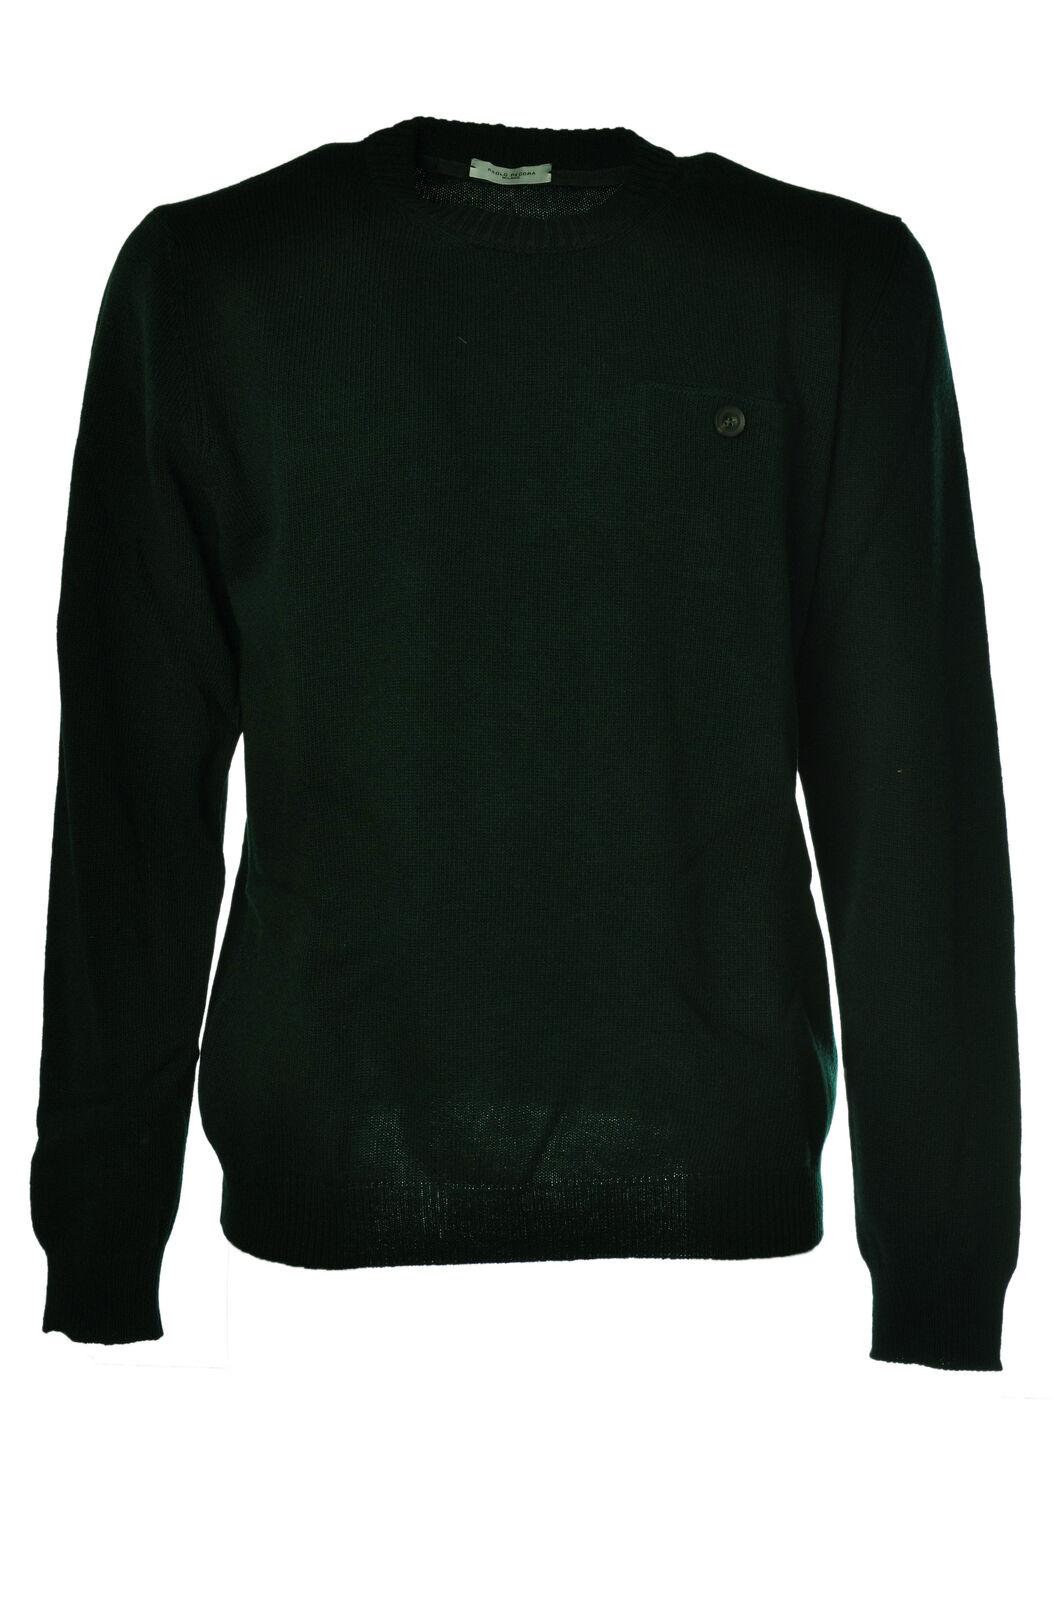 Paolo Pecora - Knitwear-Sweaters - Man - Grün - 1023418C185543